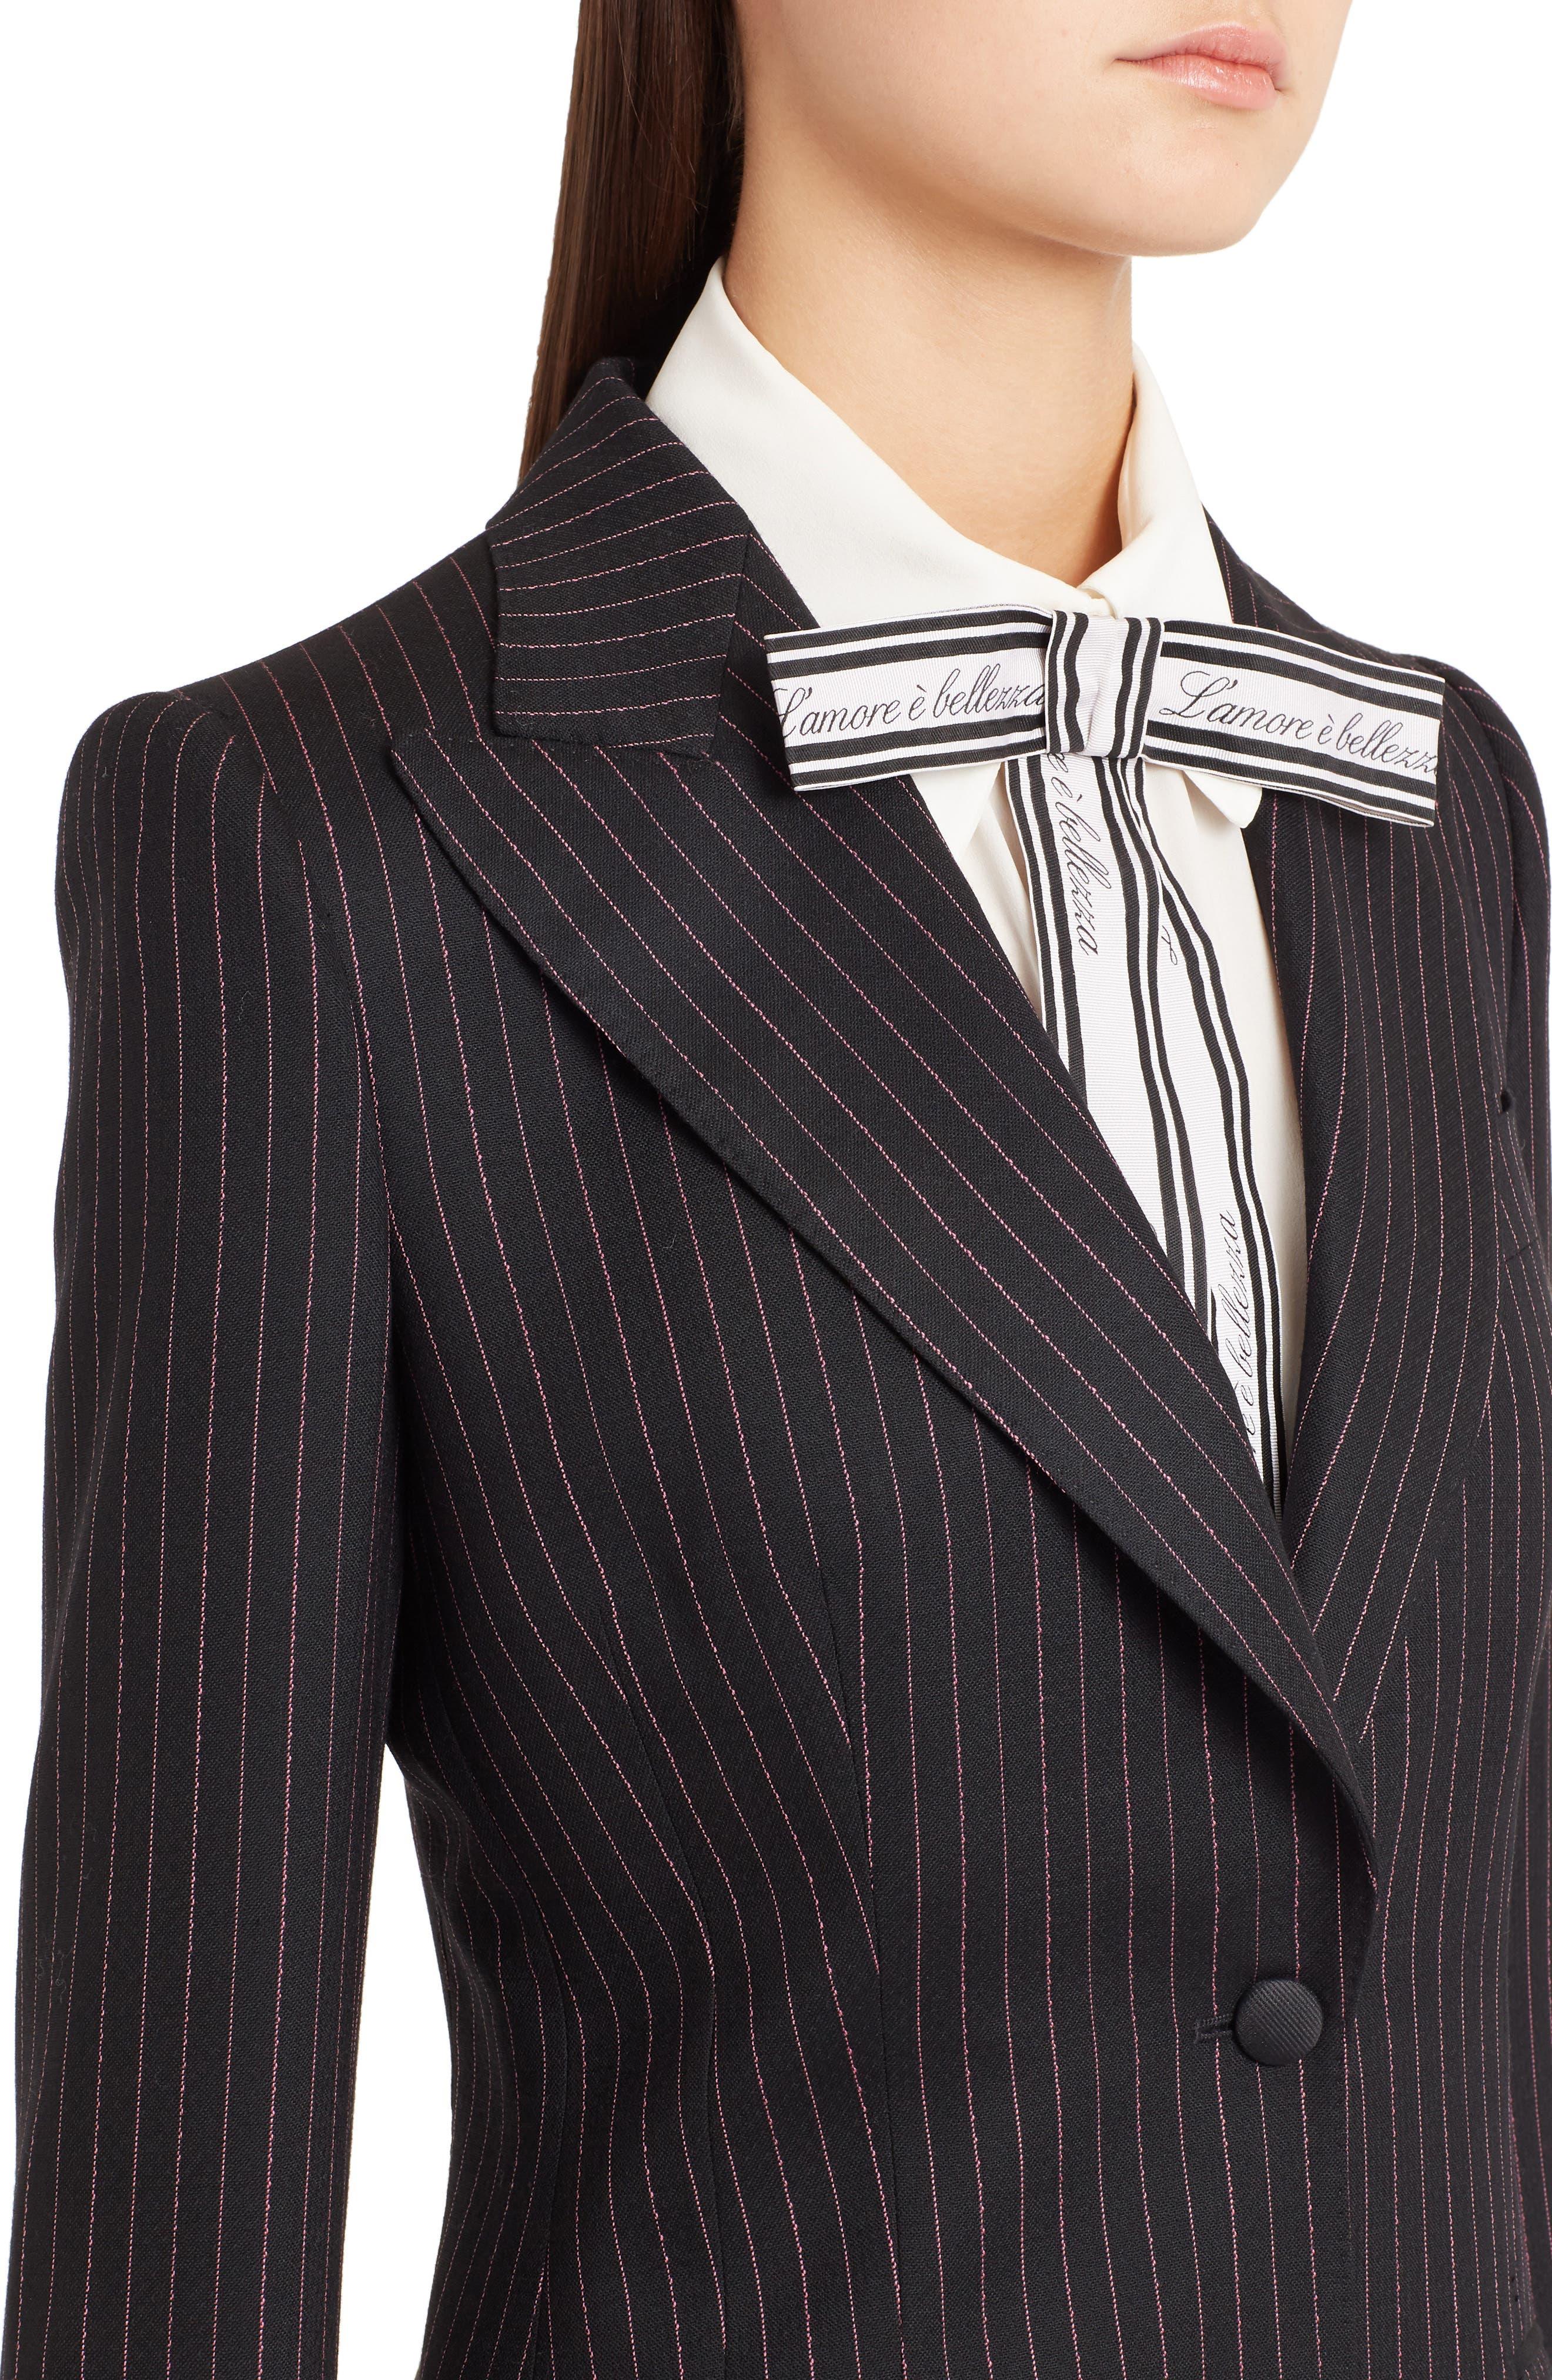 Pinstripe Stretch Wool Jacket,                             Alternate thumbnail 4, color,                             BLACK